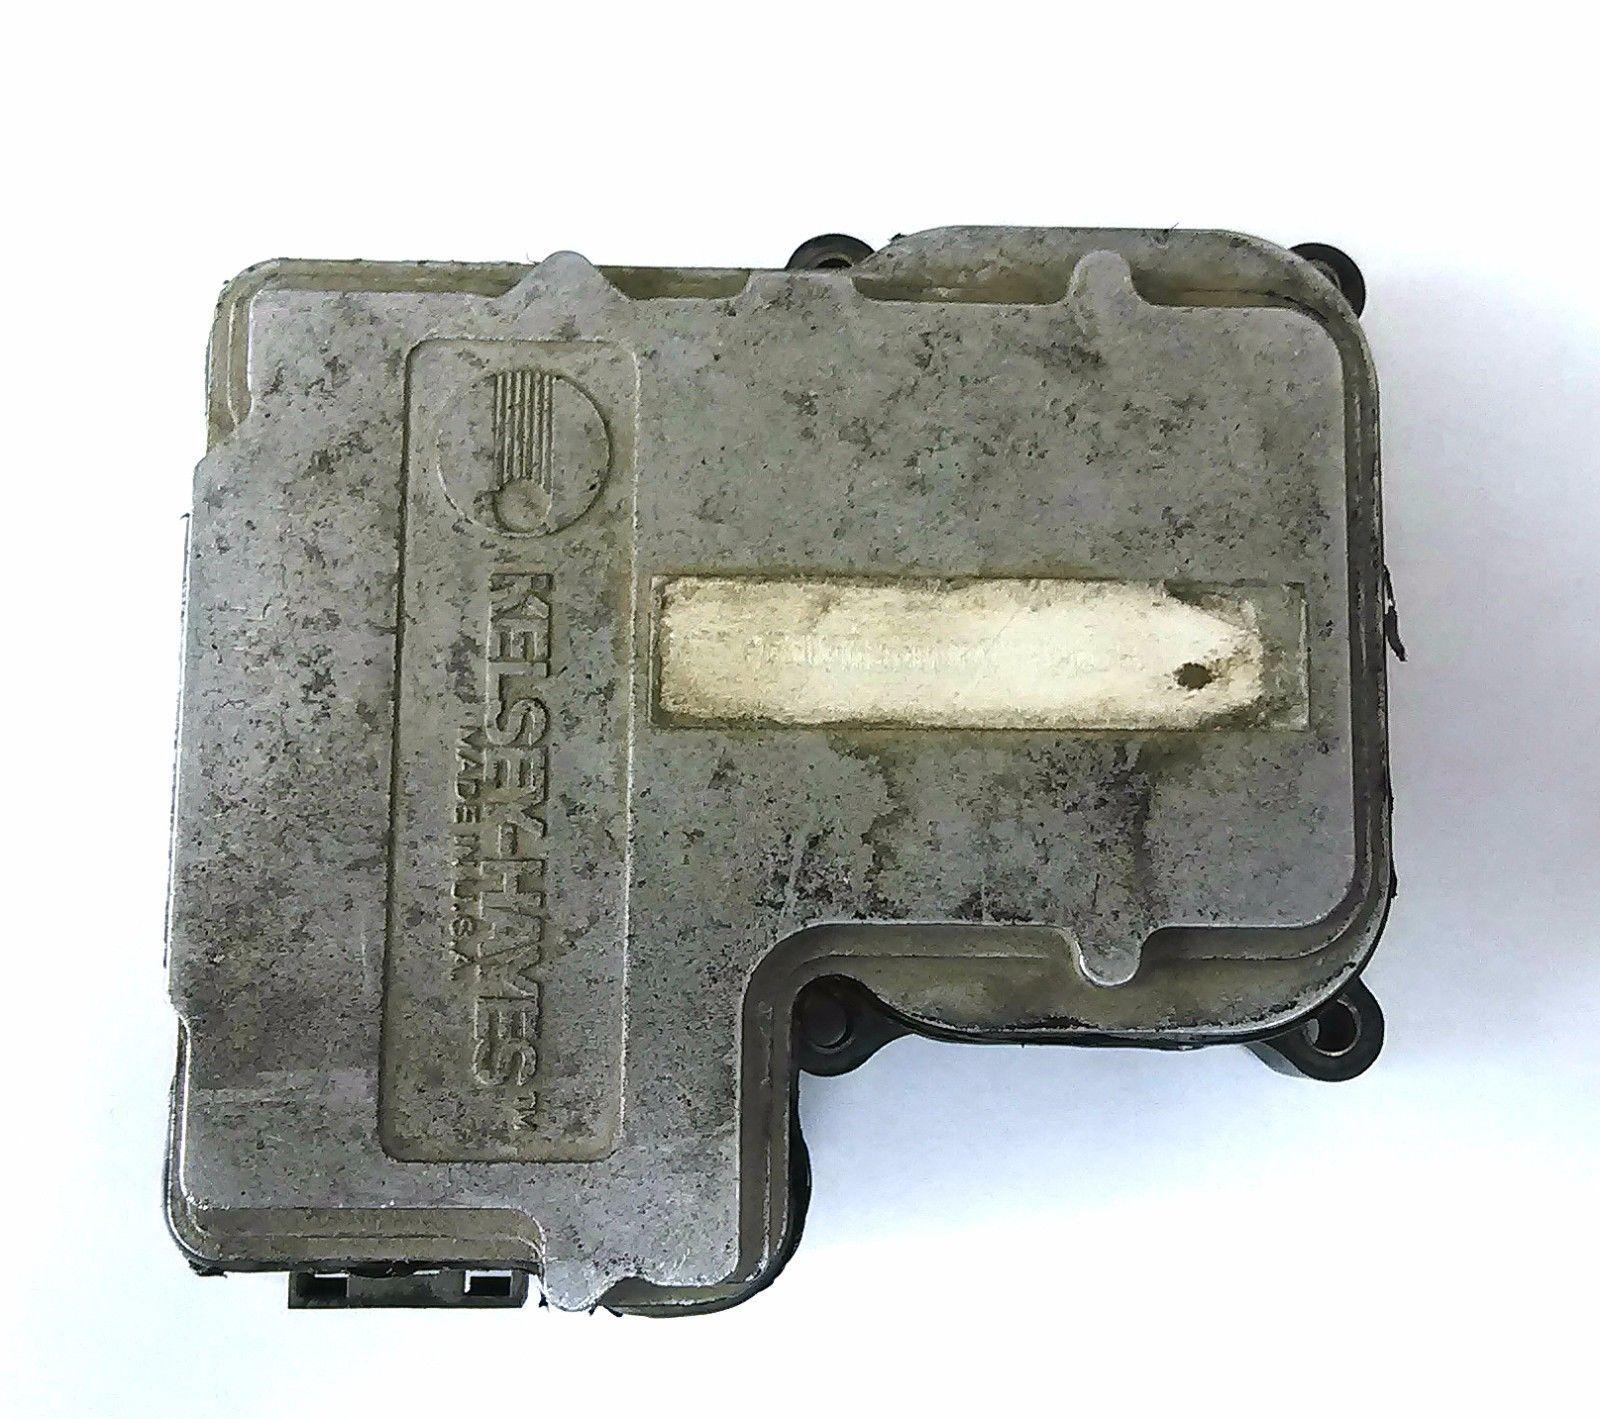 >EXCHANGE< 1999-2005 Chevy Astro GMC Safari ABS Pump Control Module EBCM & - $139.00